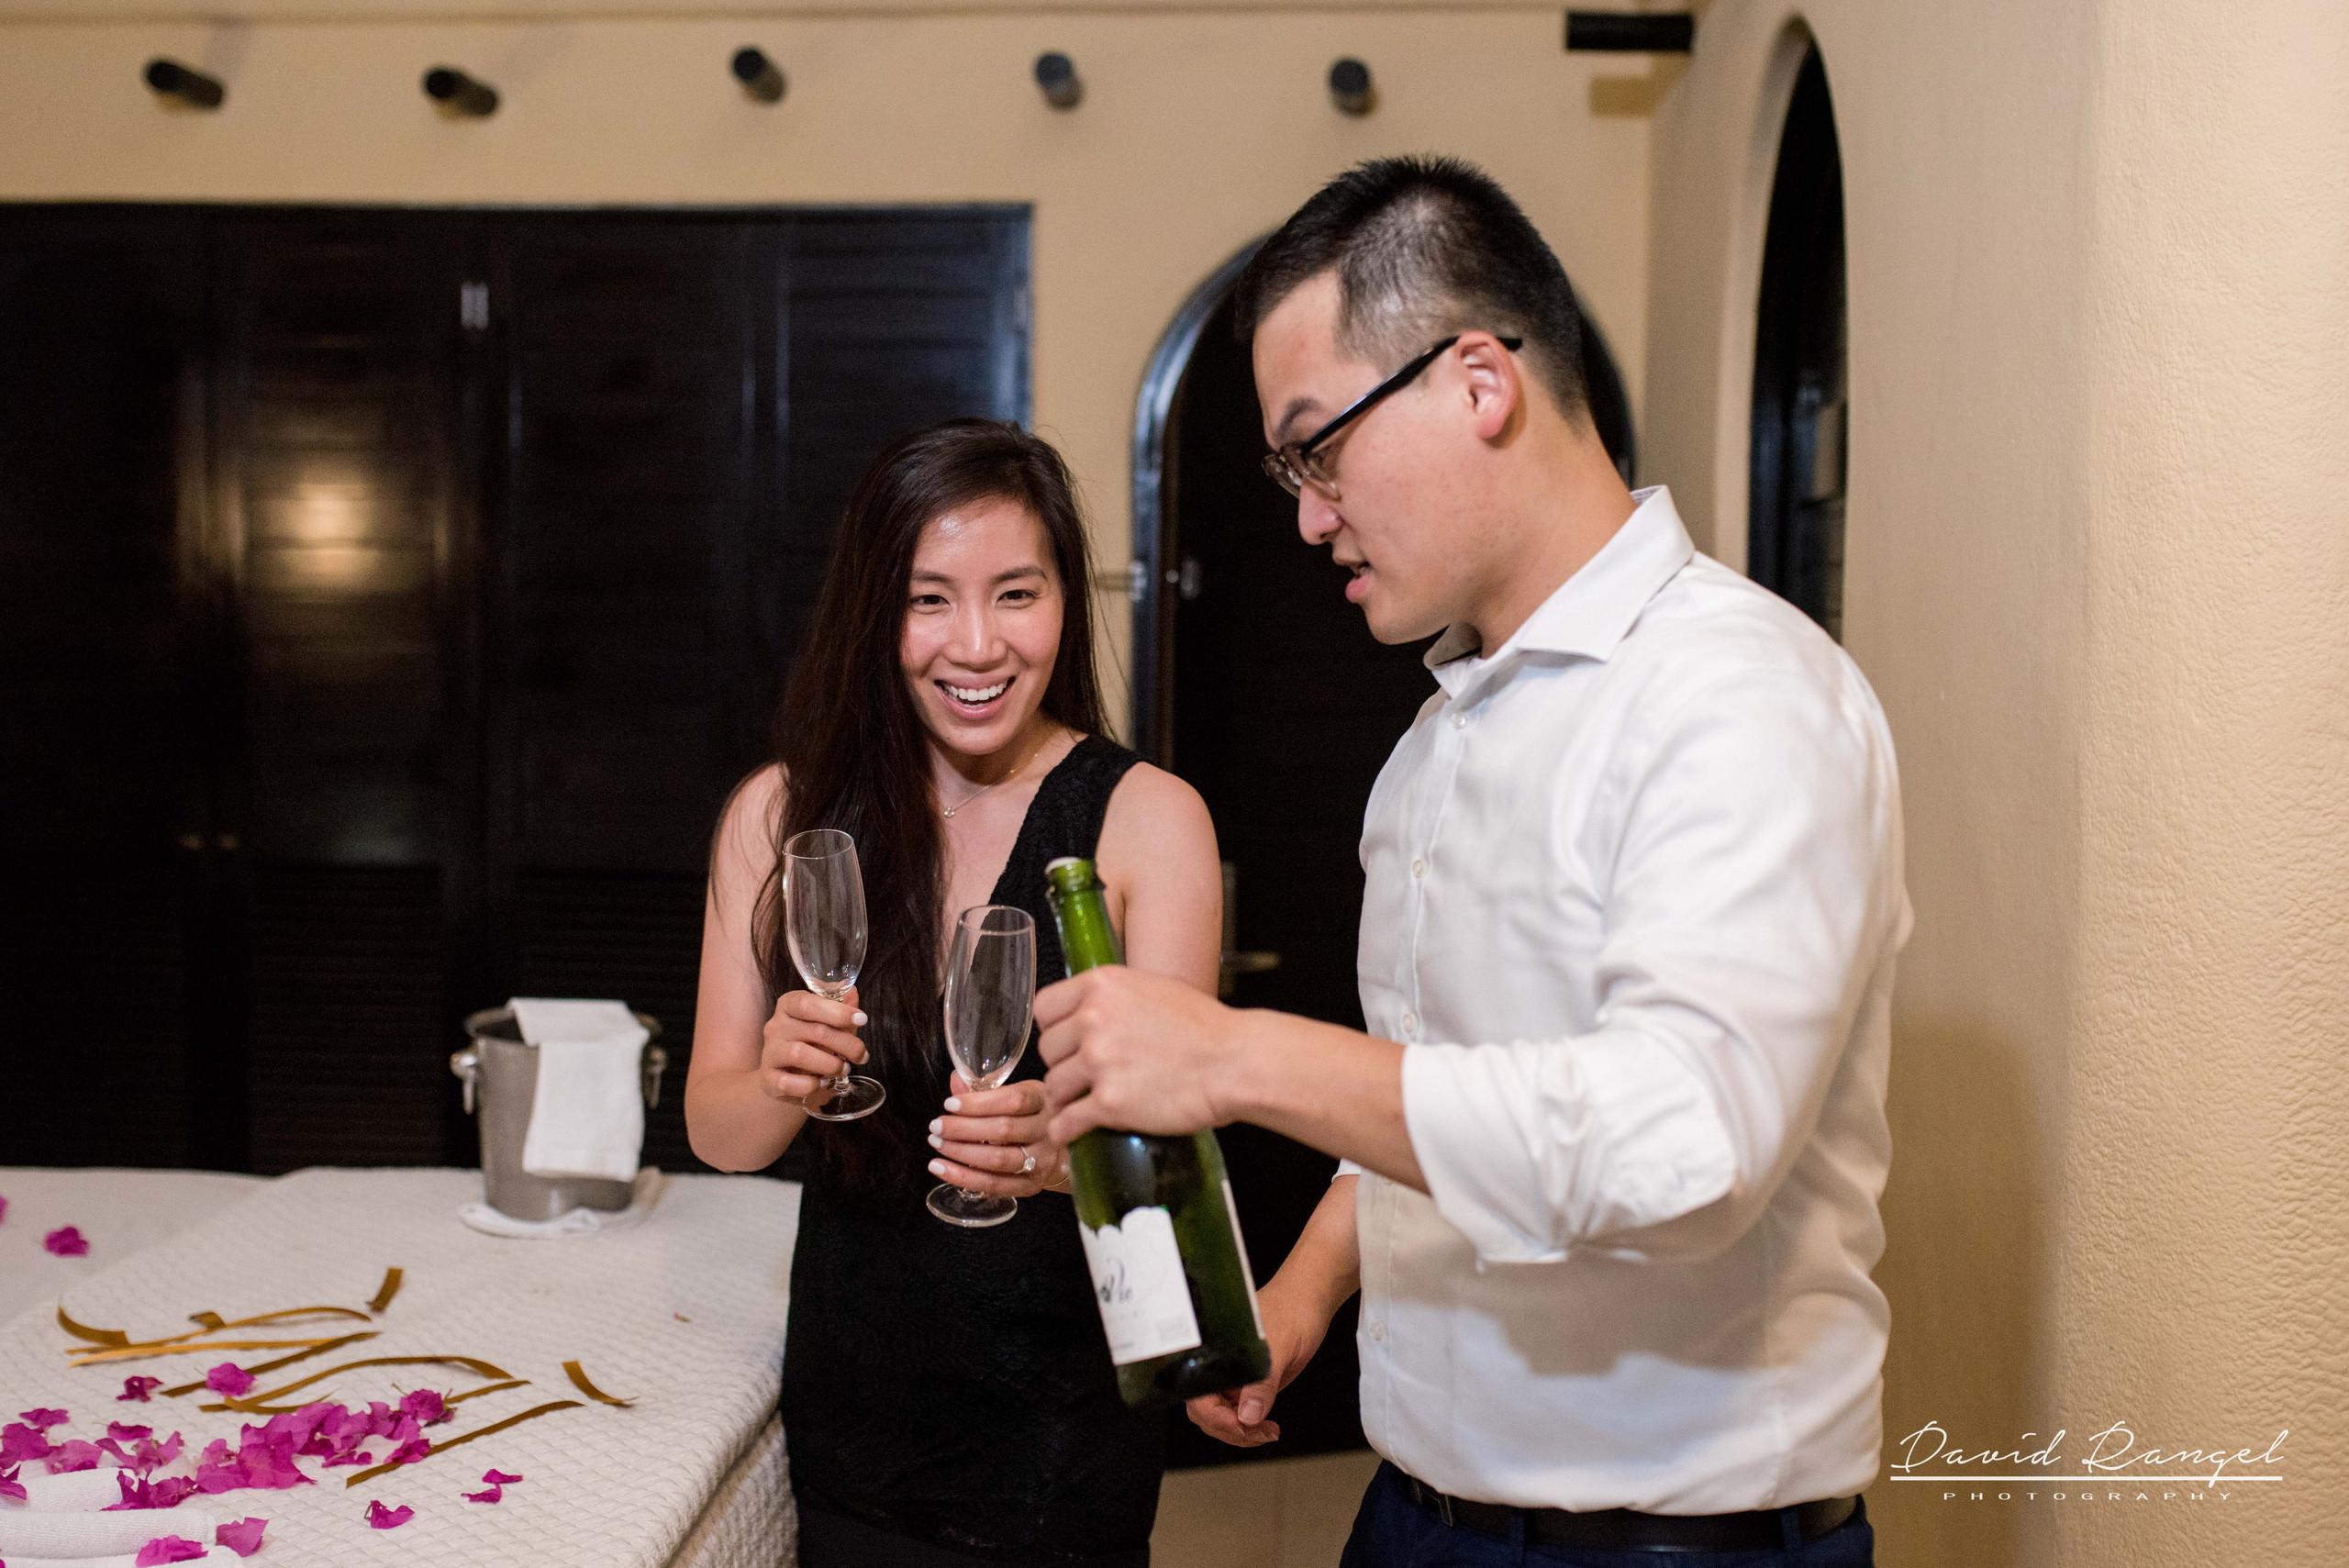 engagement+session+marriage+proposal+couple+night+photo+dorado+casitas+playa+del+carmen+photographer+destination+celebration+champagne